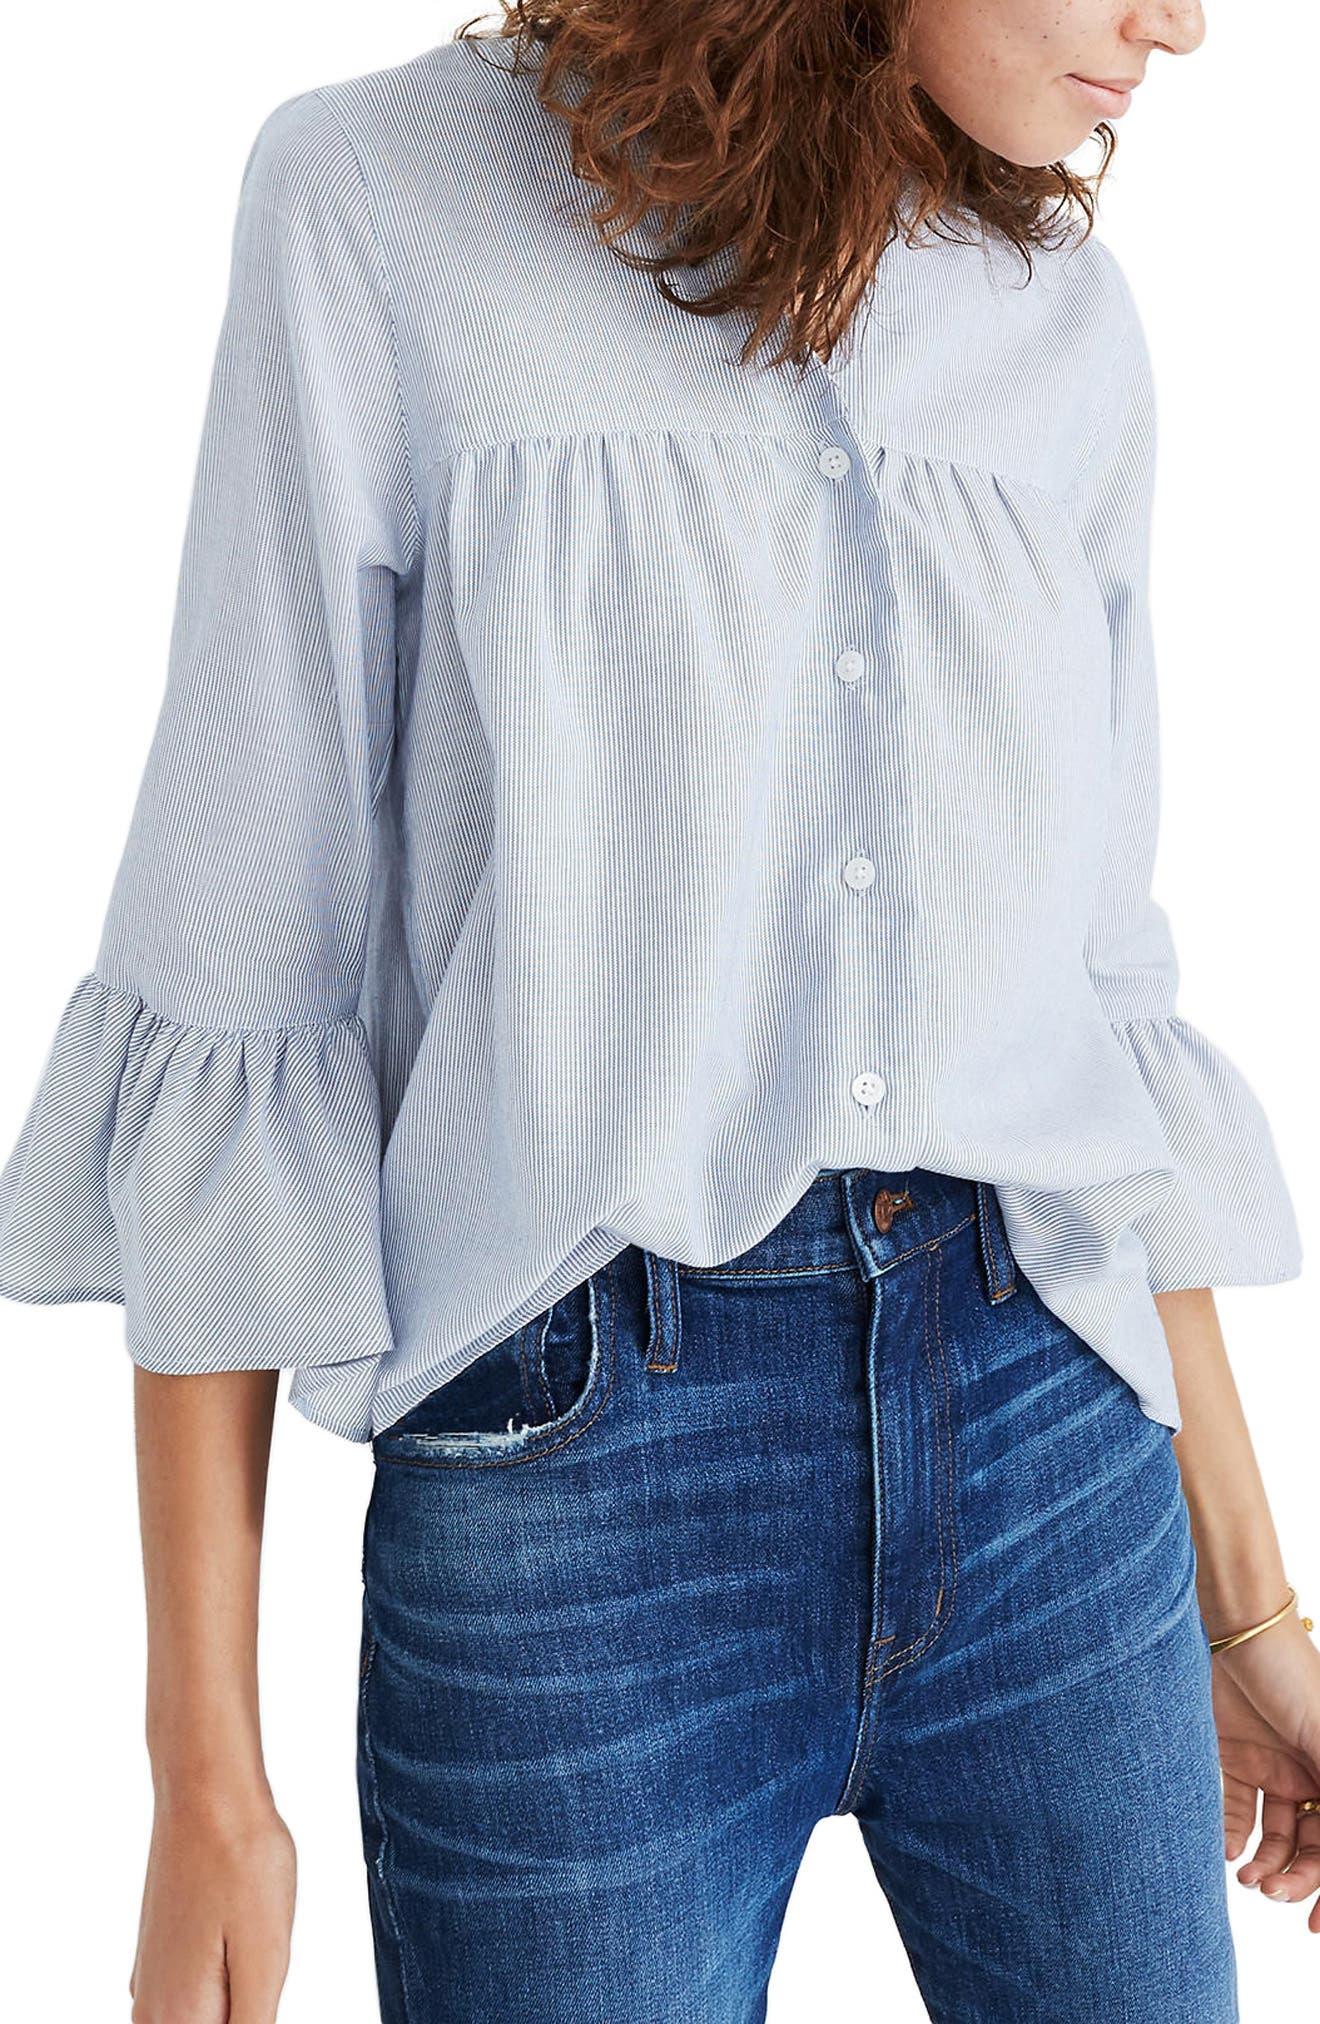 Veranda Bell Sleeve Shirt,                         Main,                         color, Royal Blue